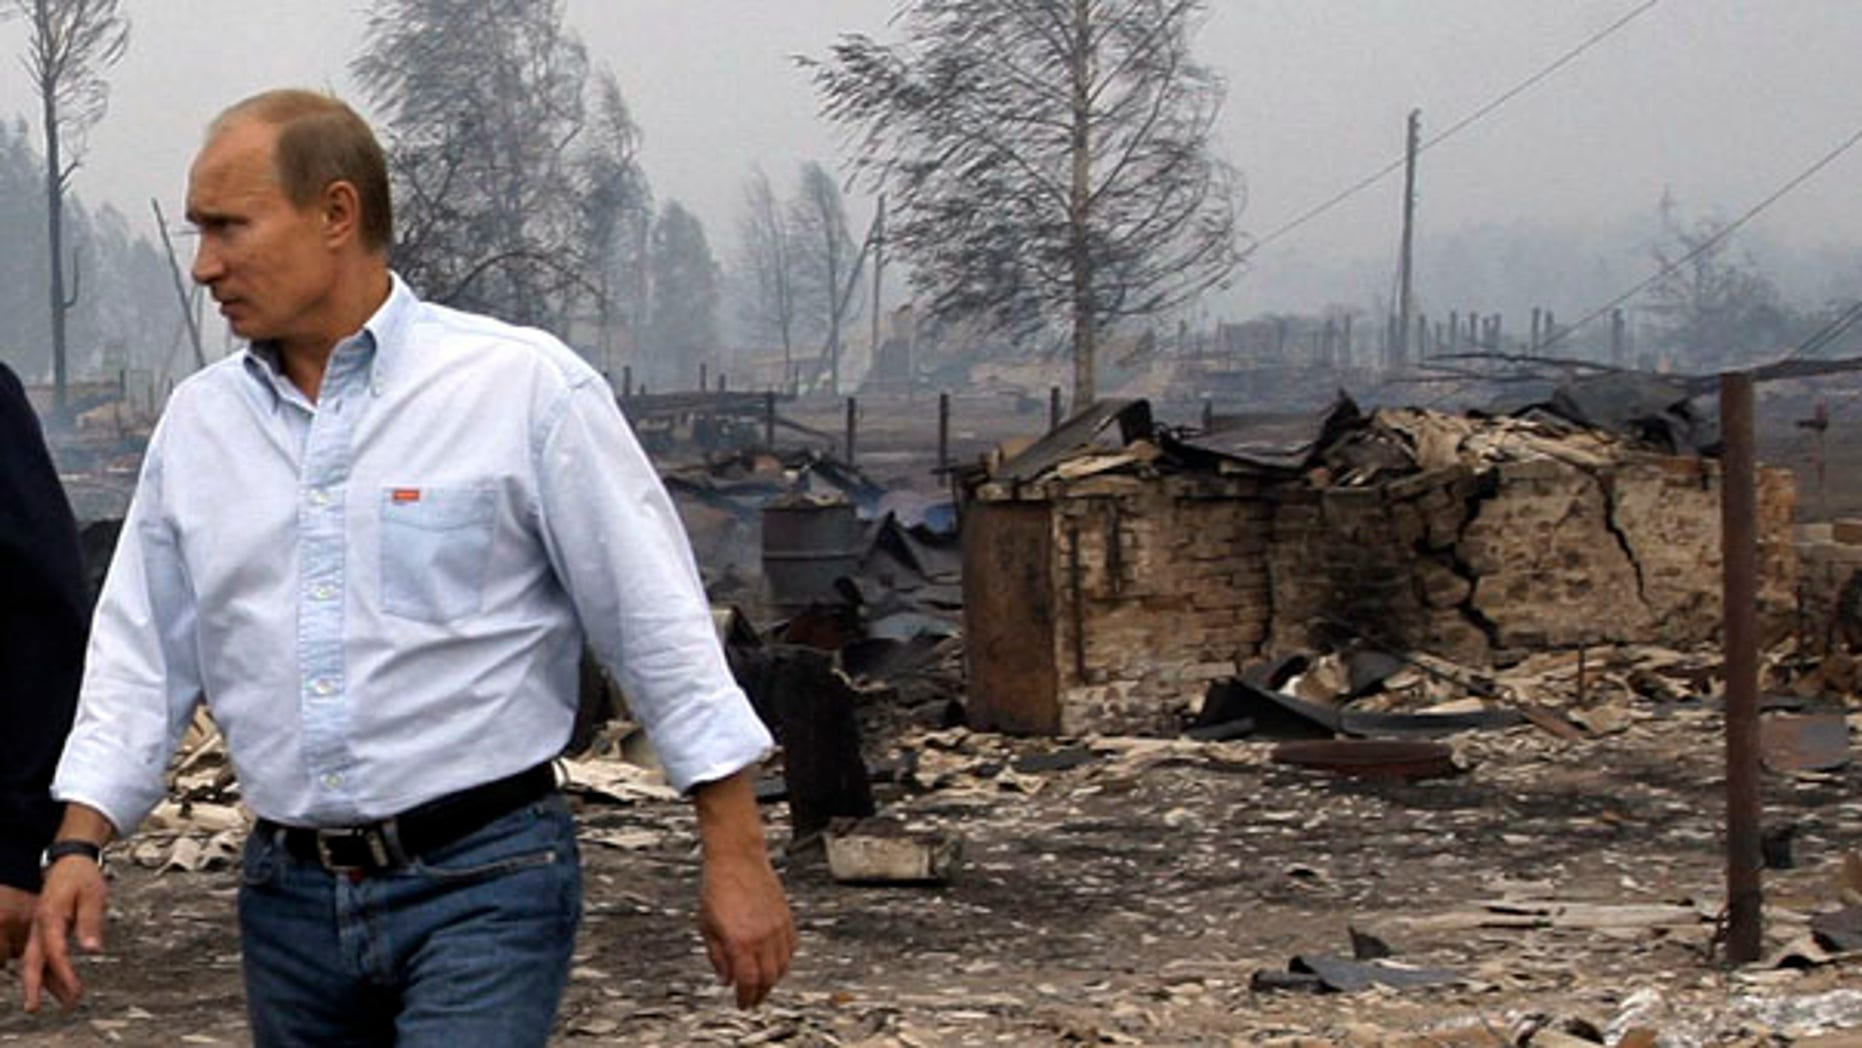 July 30: Russian Prime Minister Vladimir Putin tours the village of Verkhnyaya Vereya, where all 341 houses have burned to the ground.